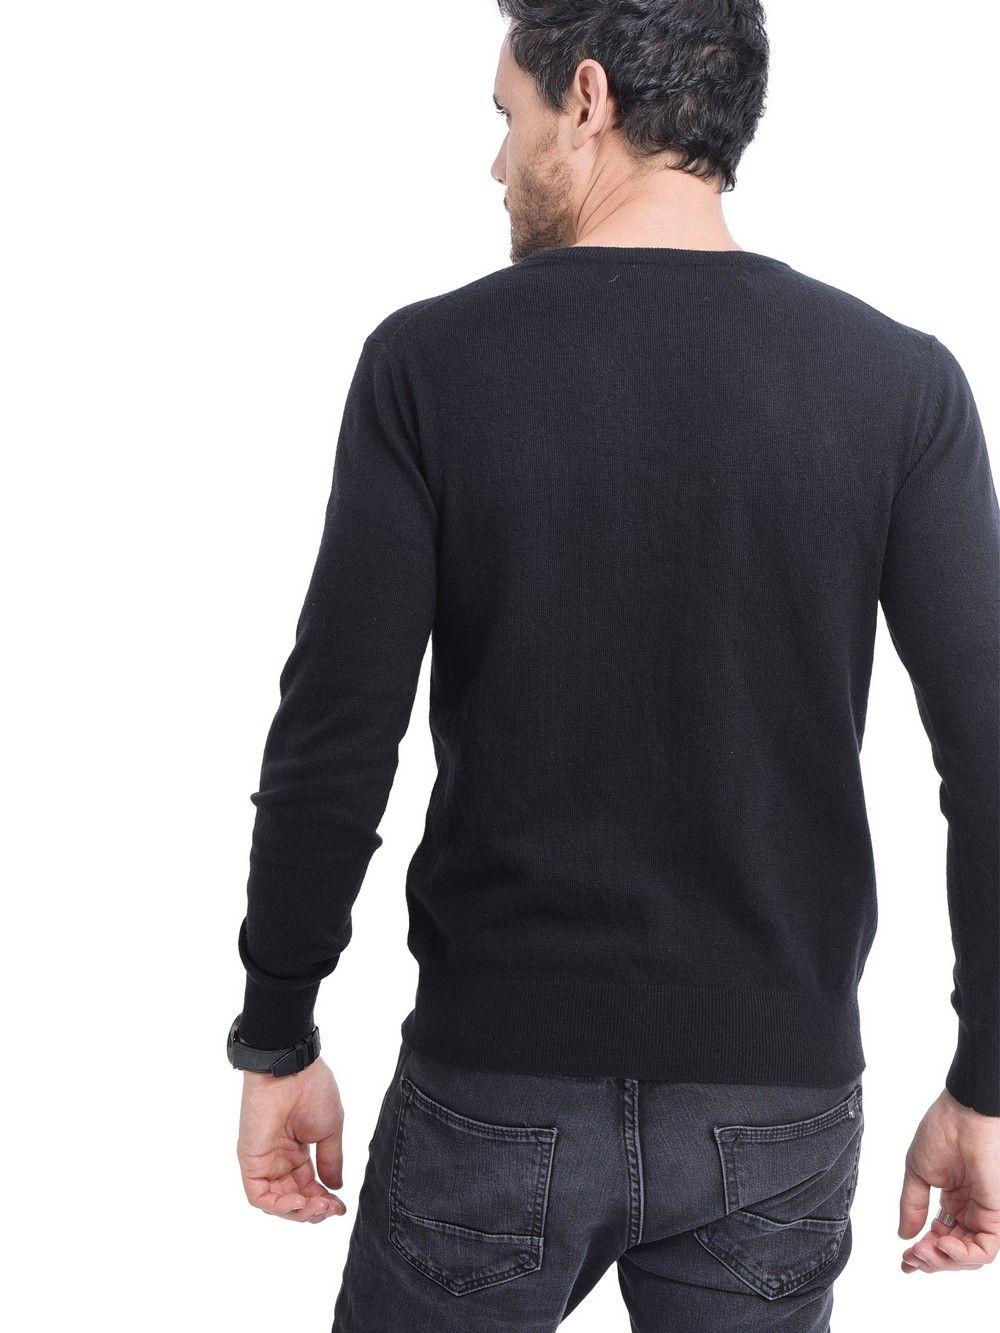 C&JO Round Neck Sweater in Black